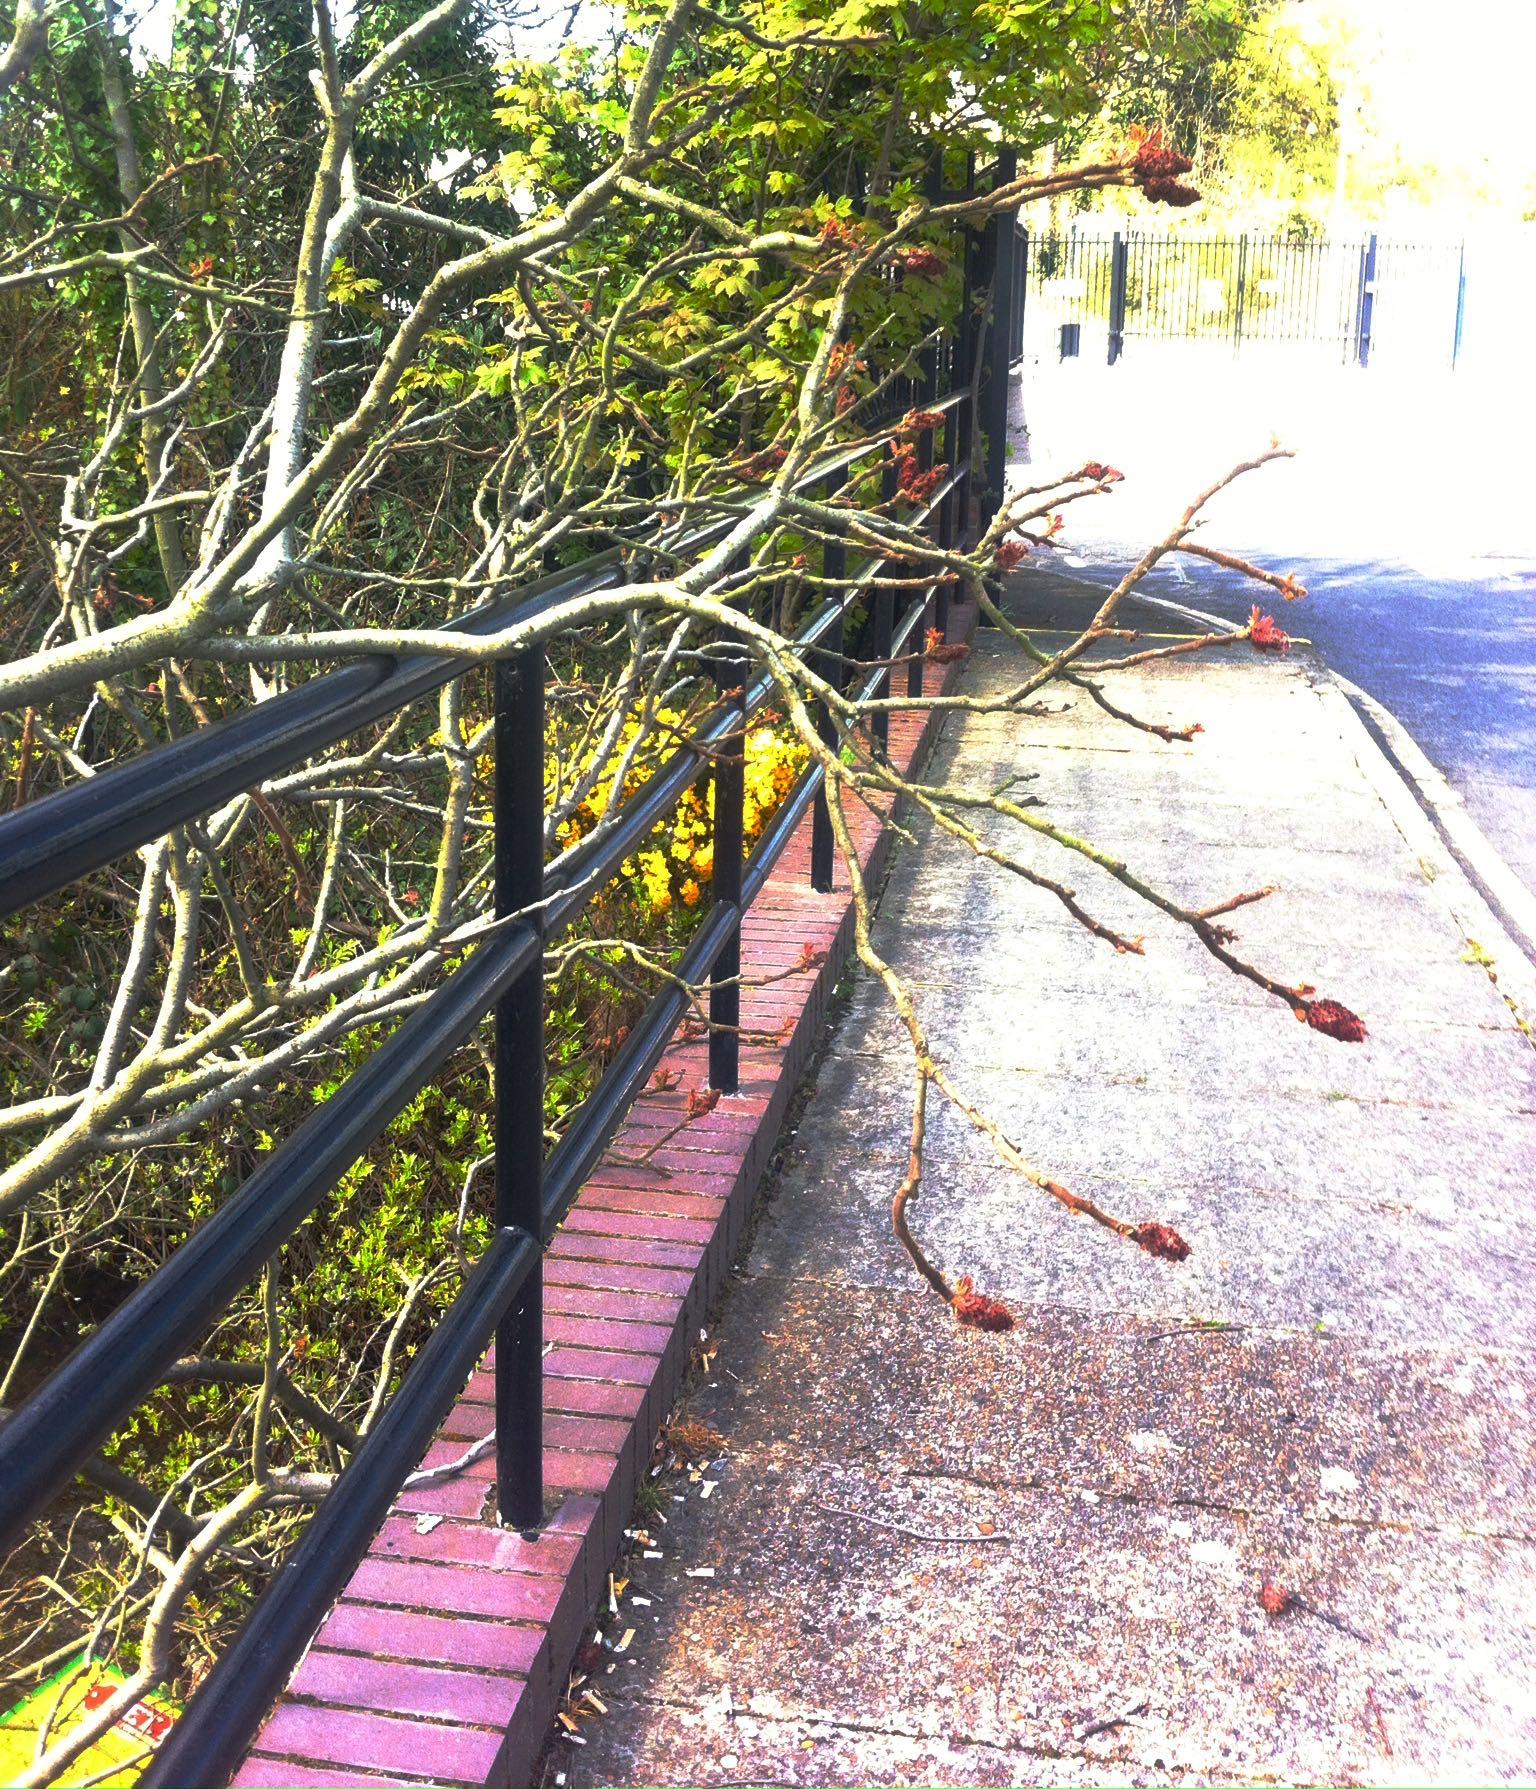 magnolia on the bridge